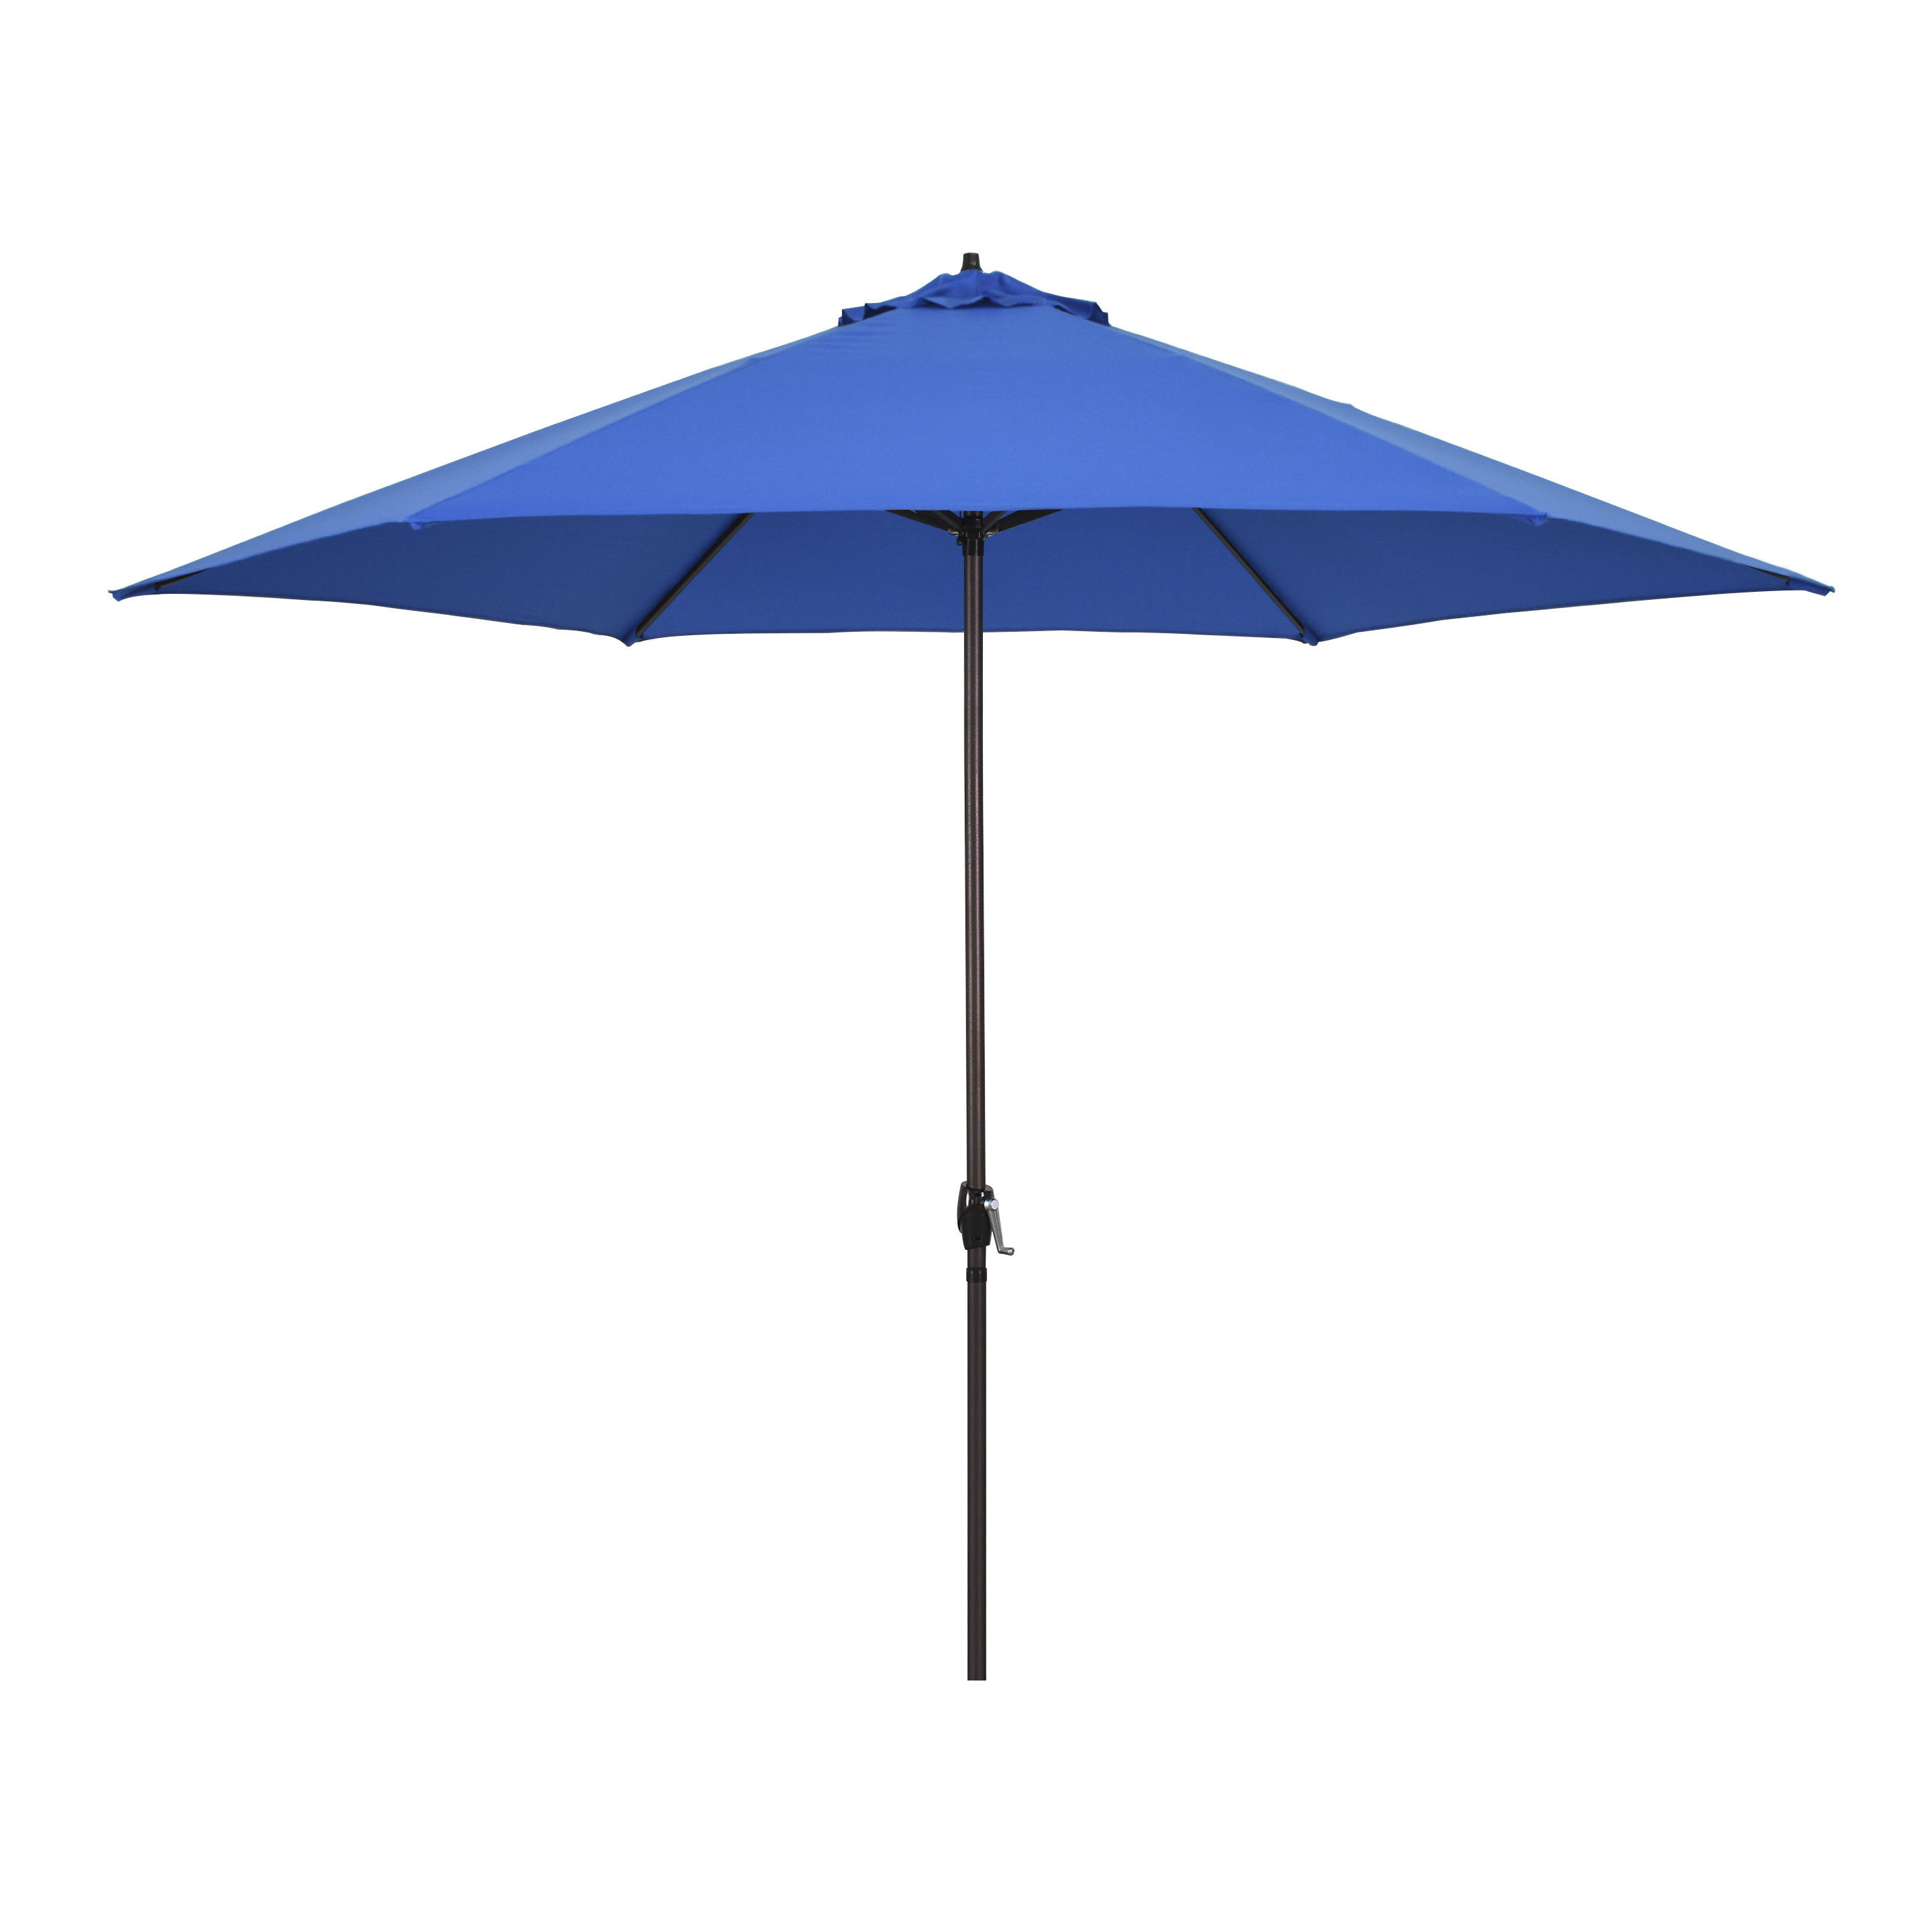 Mraz Market Umbrellas Regarding Well Known Mcdougal 11' Market Umbrella (View 20 of 20)